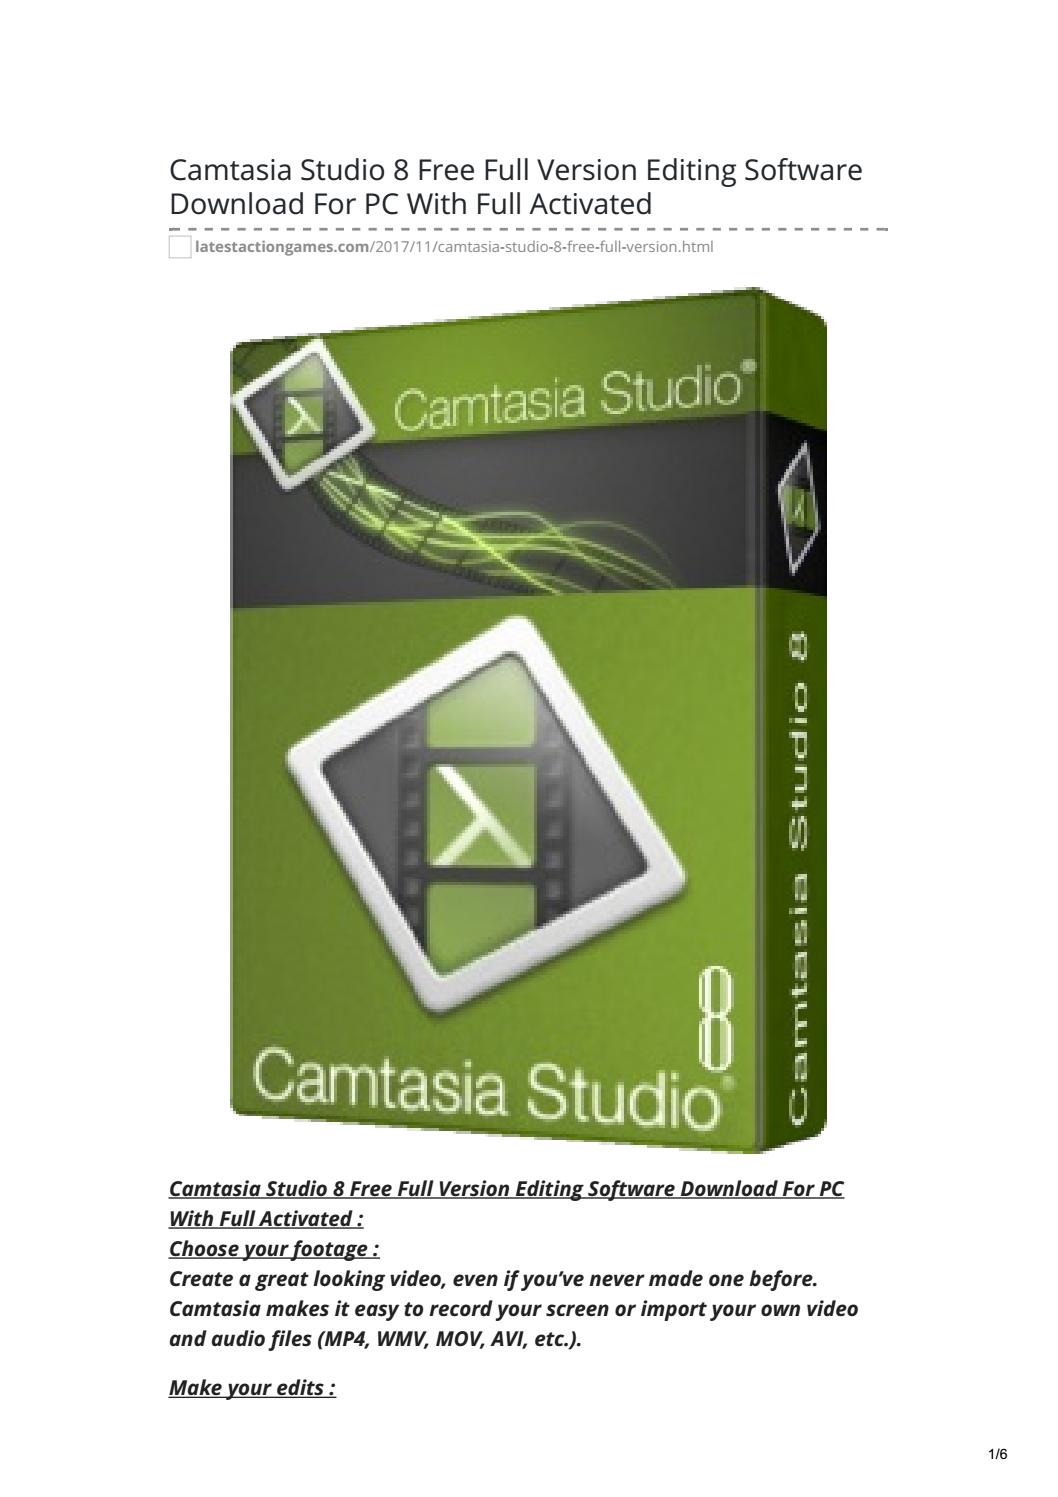 Camtasia Studio 8 Free Full Version Editing Software